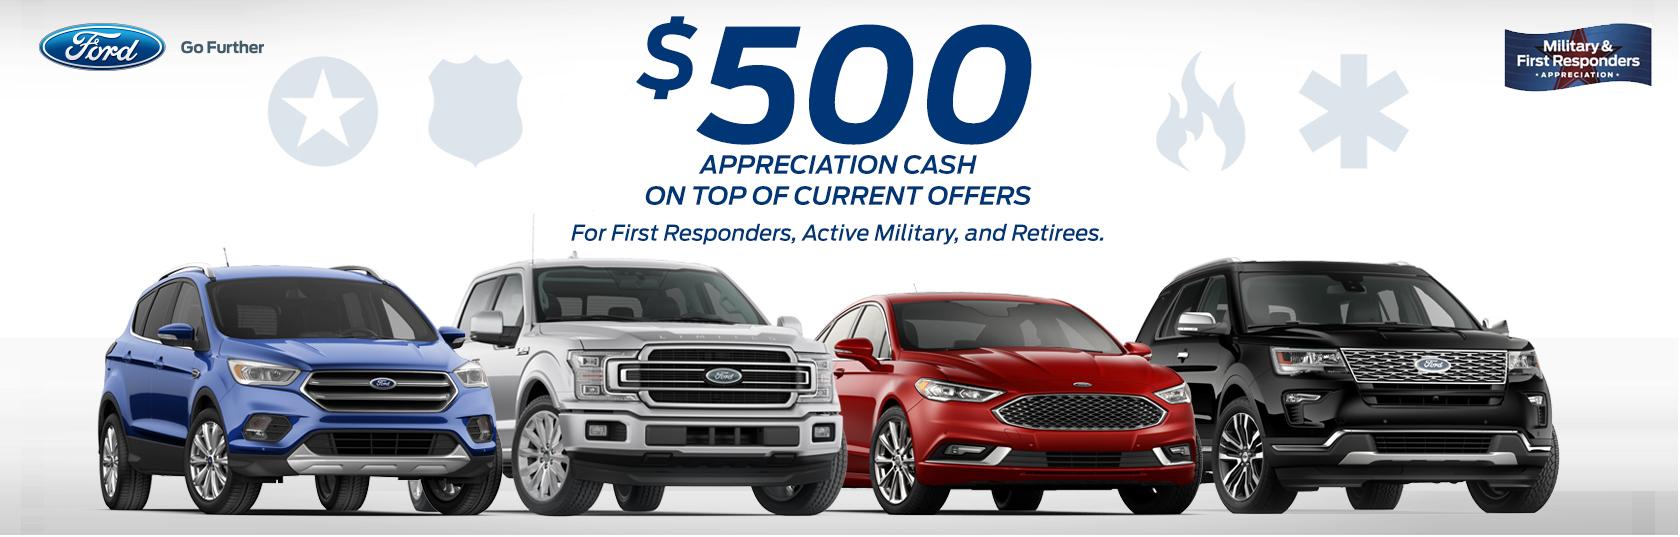 Ford First Responder >> 500 Appreciation Cash Deacon Jones Ford Of Goldsboro